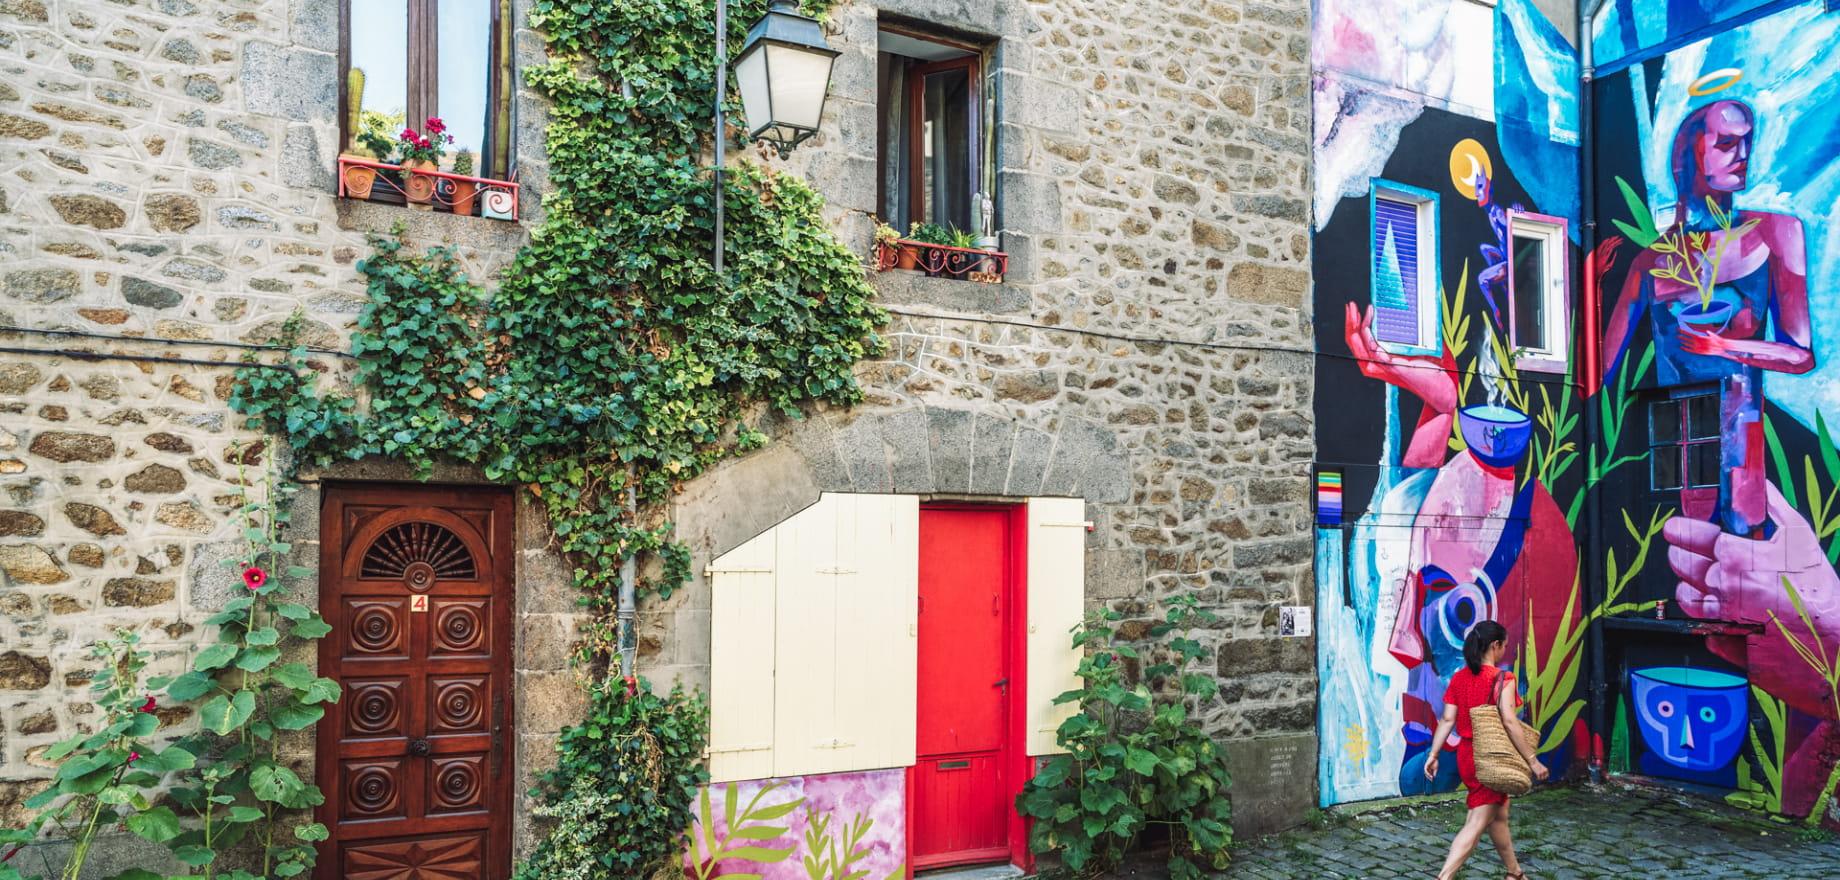 Place au lin a Saint-Brieuc - Street art